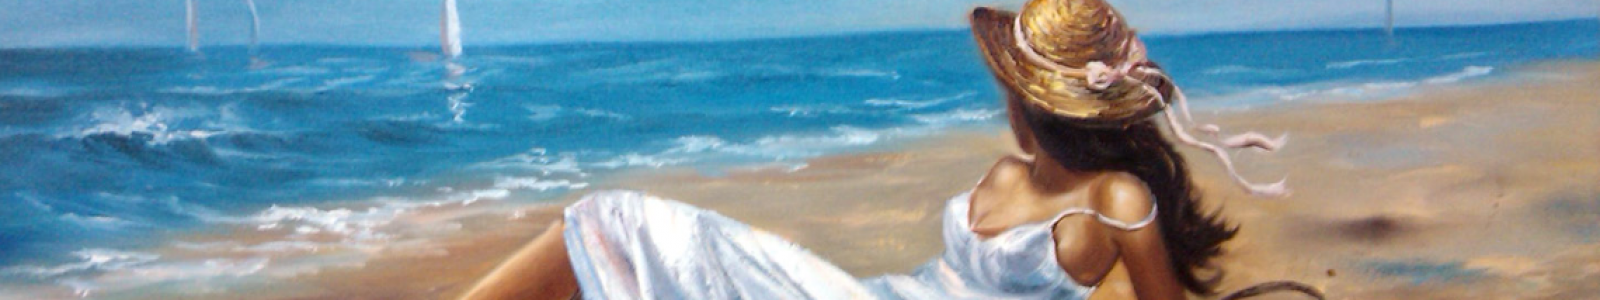 Gallery Painter Olga Samchuk